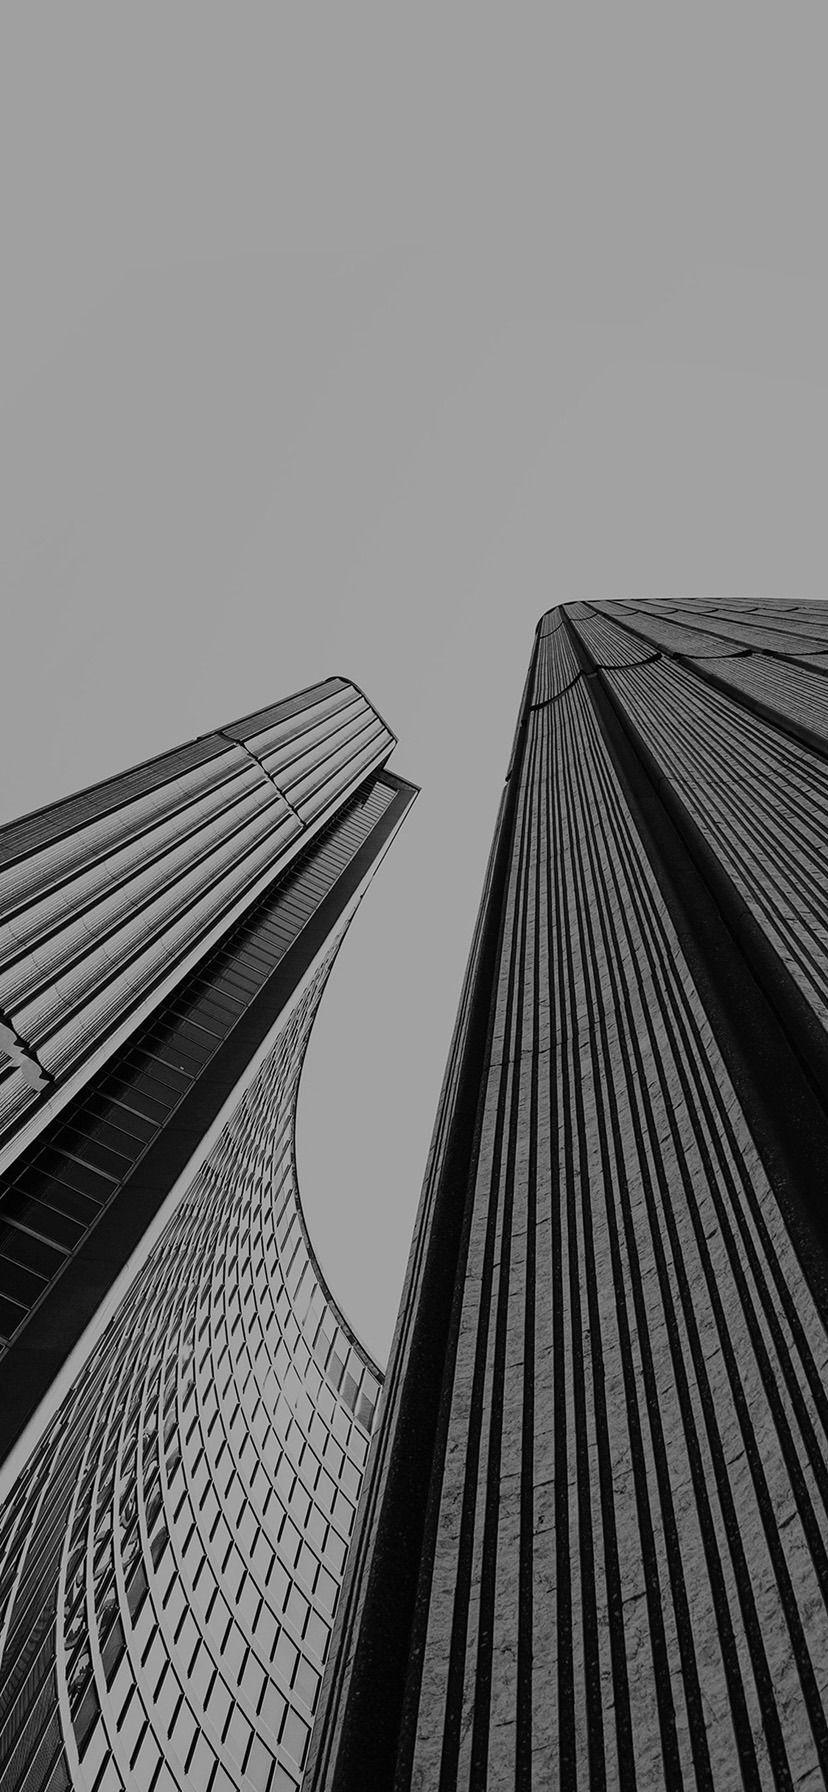 Iphone Xr Wallpaper Architecture Building City Art Dark Bw Black